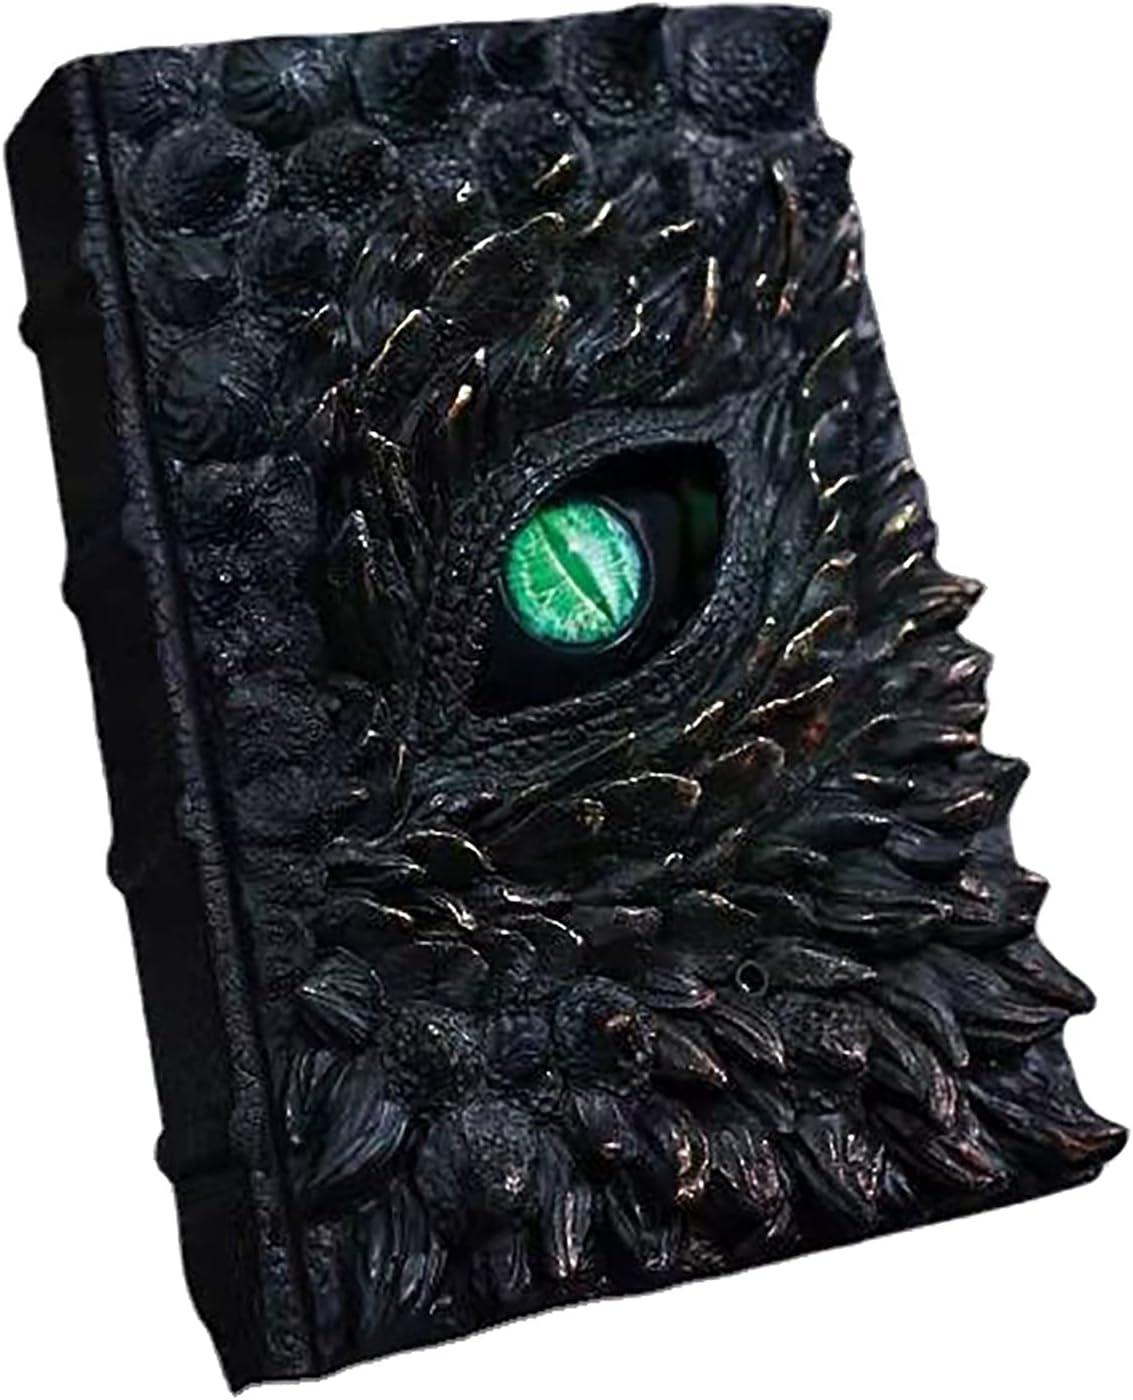 Very popular! Fashionable Halloween Animated Dragon Eye Book Home Be Living Room